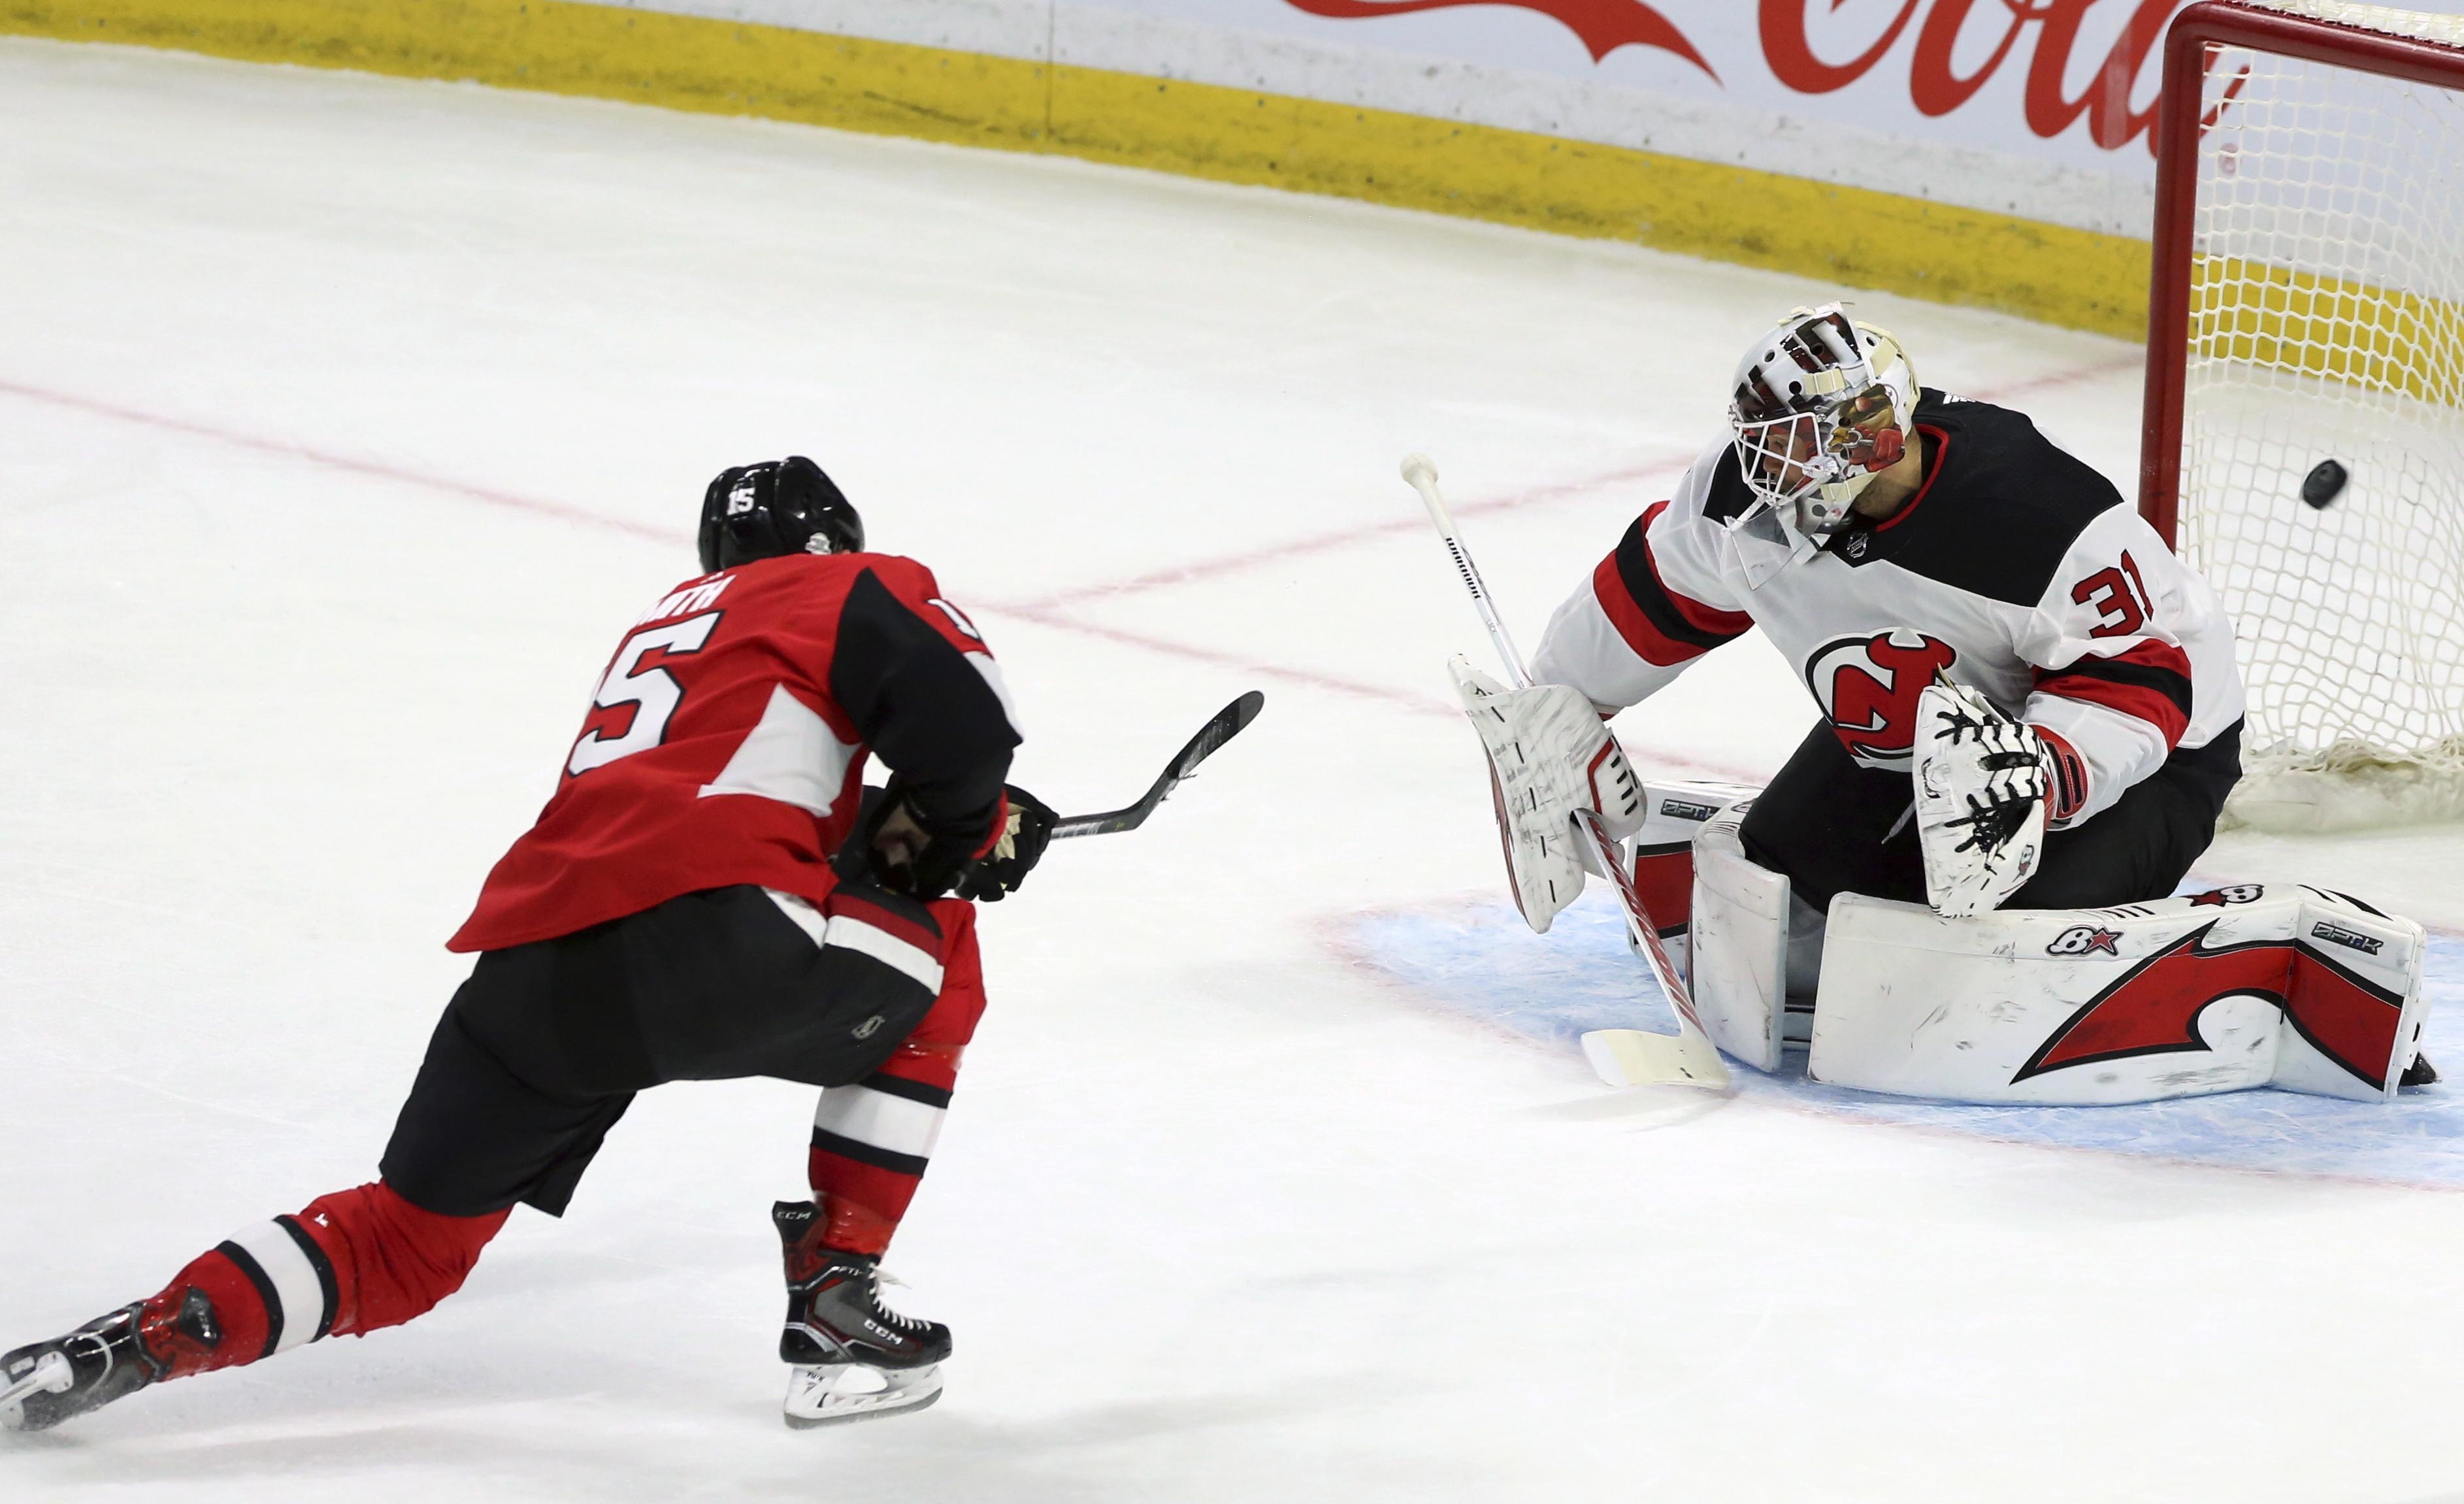 b778438db6e Duchene leads undermanned Senators to 5-3 win over Devils - Washington Times